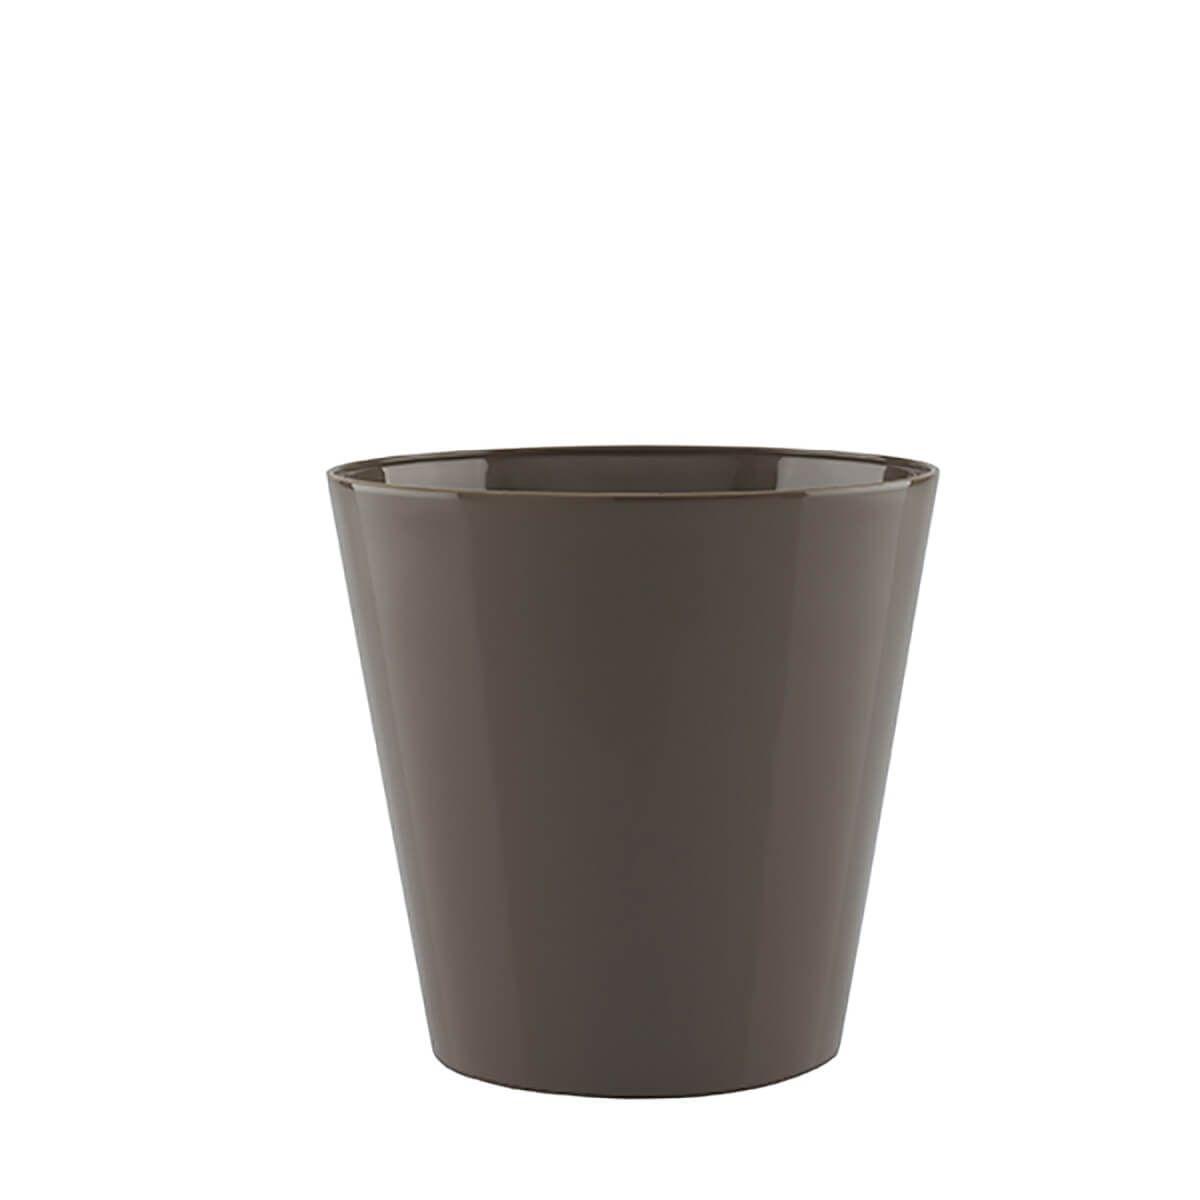 Vaso Porto 18 x 16 cm Taupe Vasart